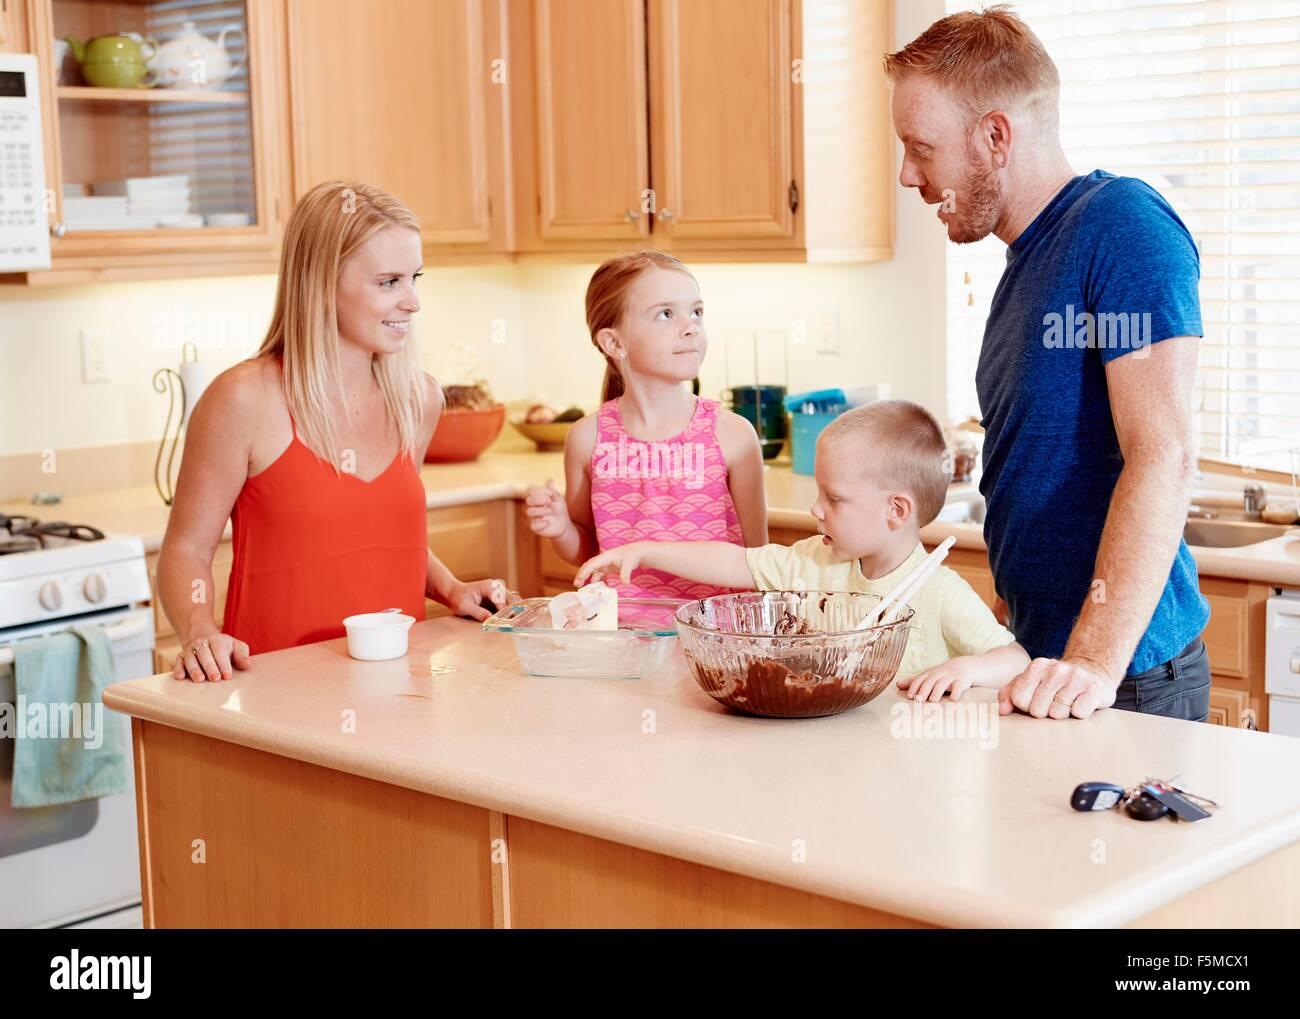 Family baking in kitchen Stock Photo